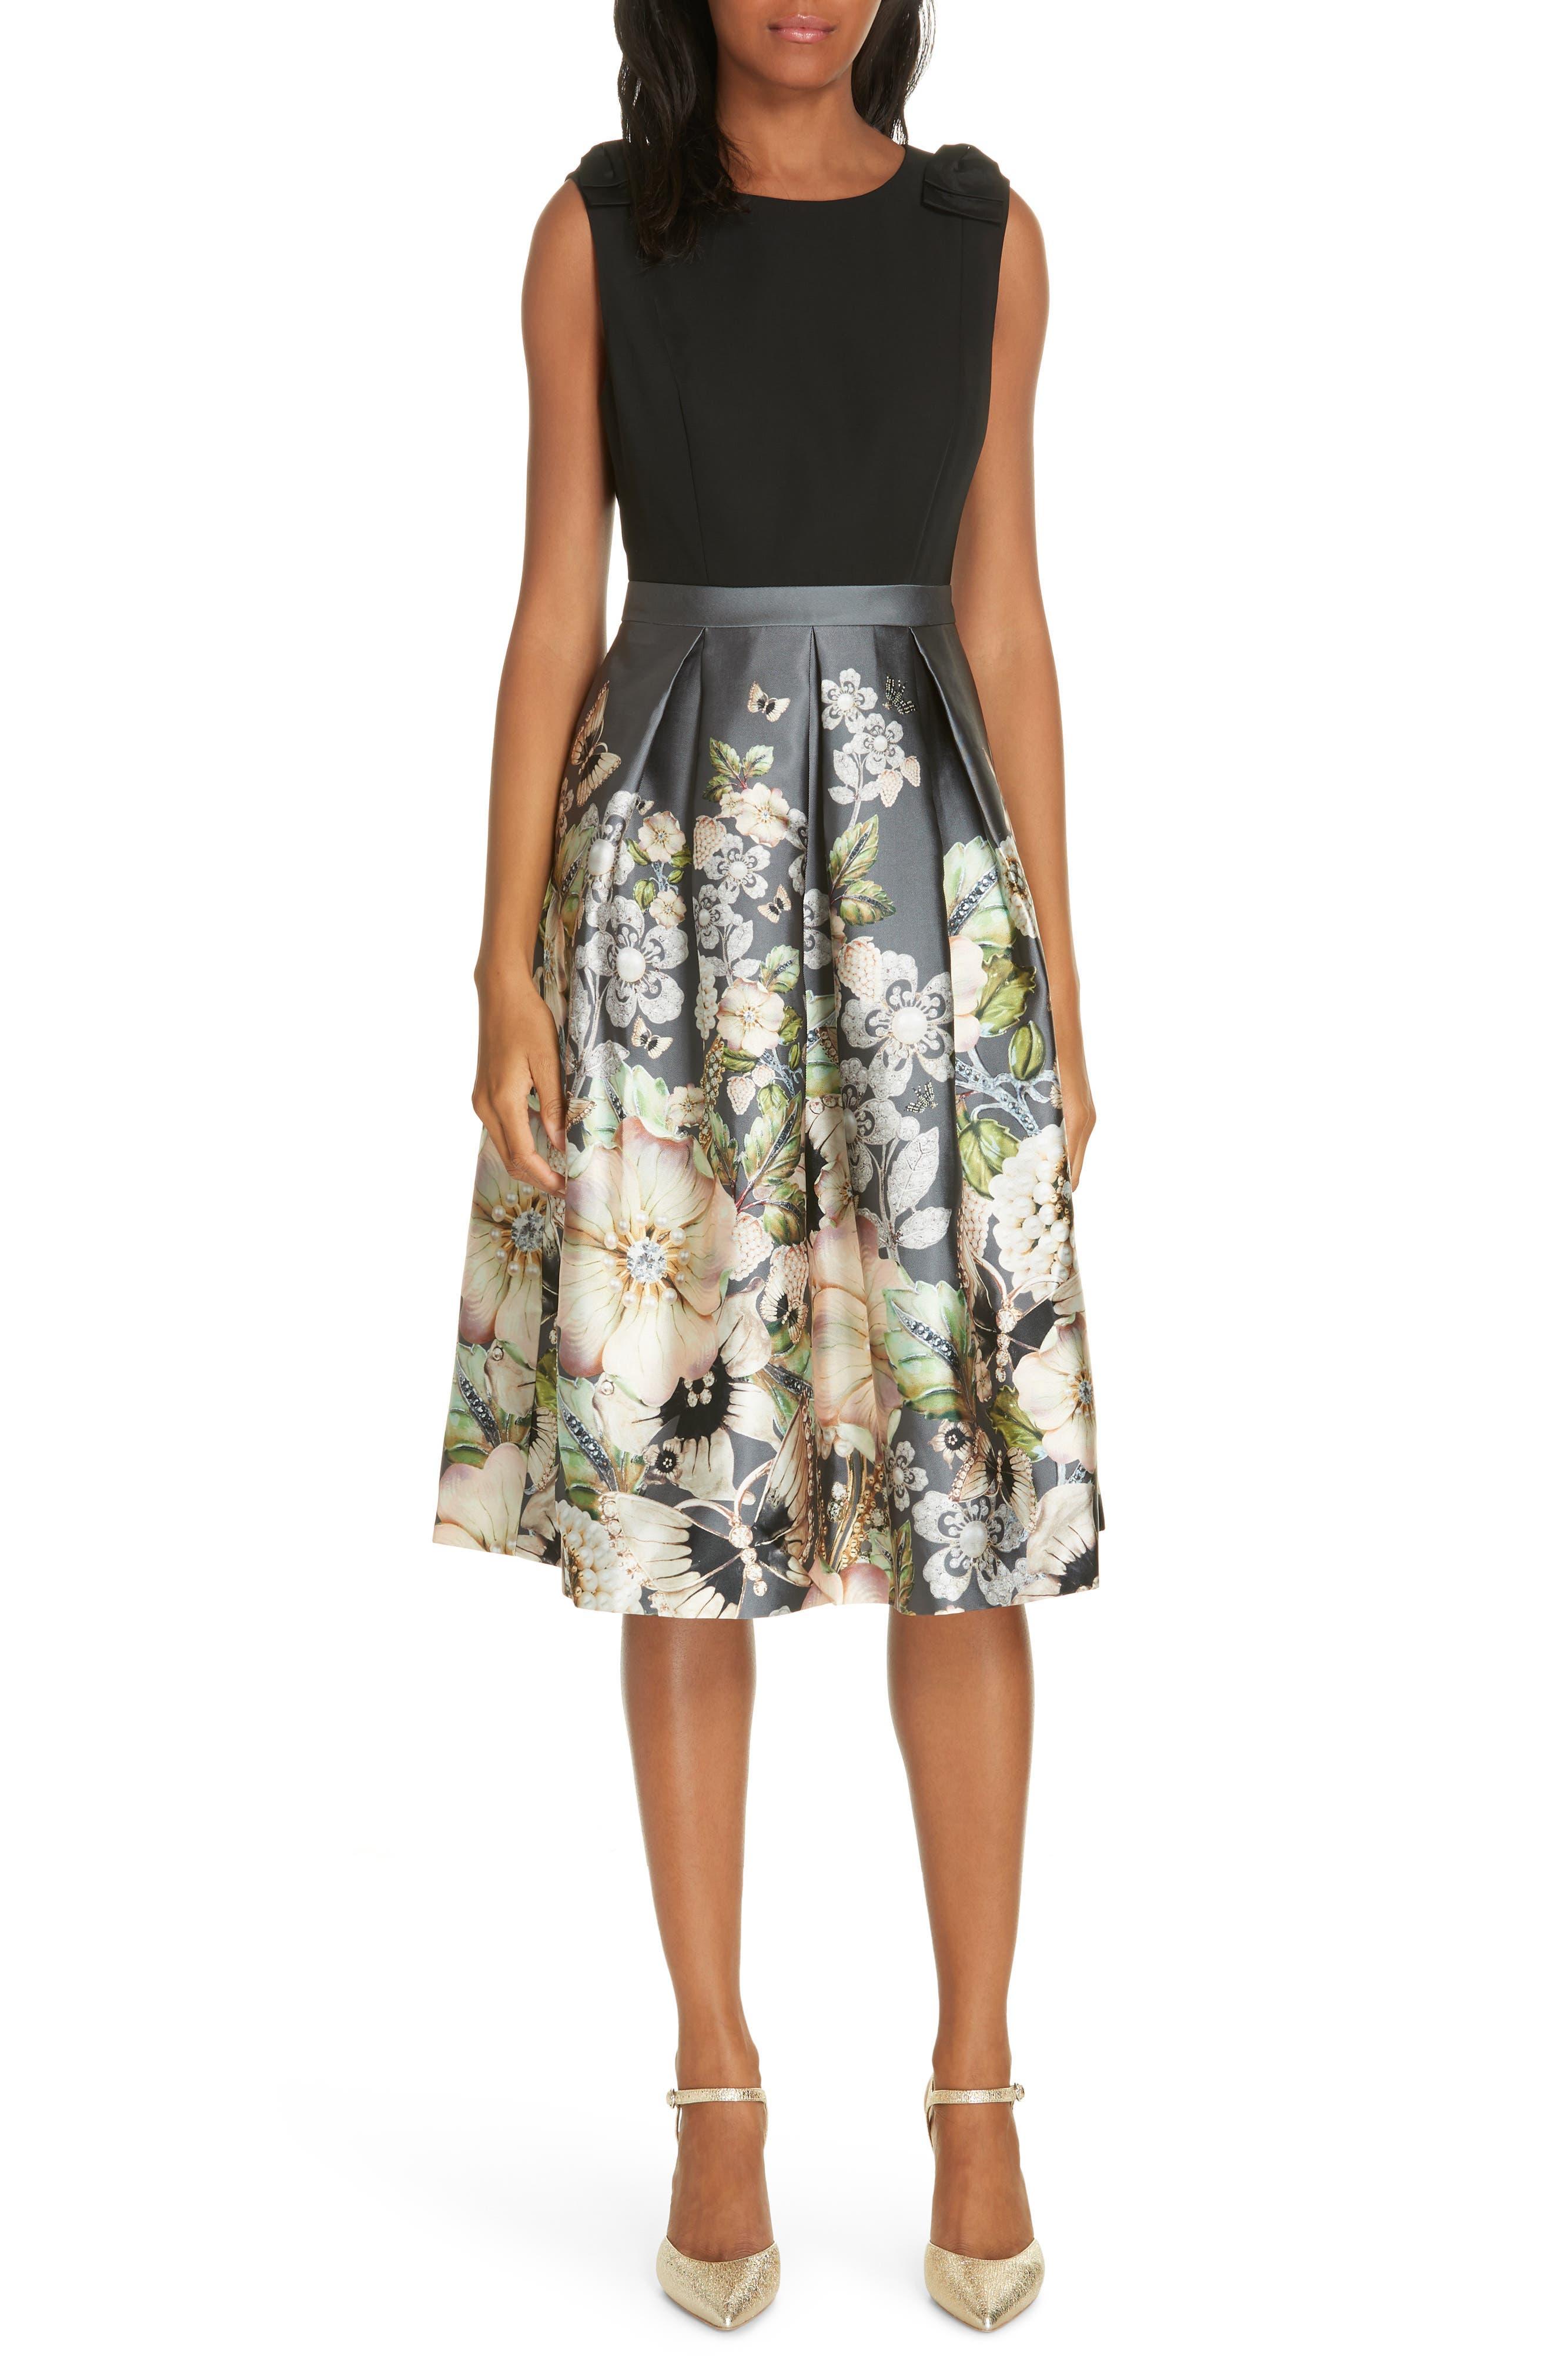 Molyka Gem Gardens Bow Dress,                         Main,                         color, CHARCOAL